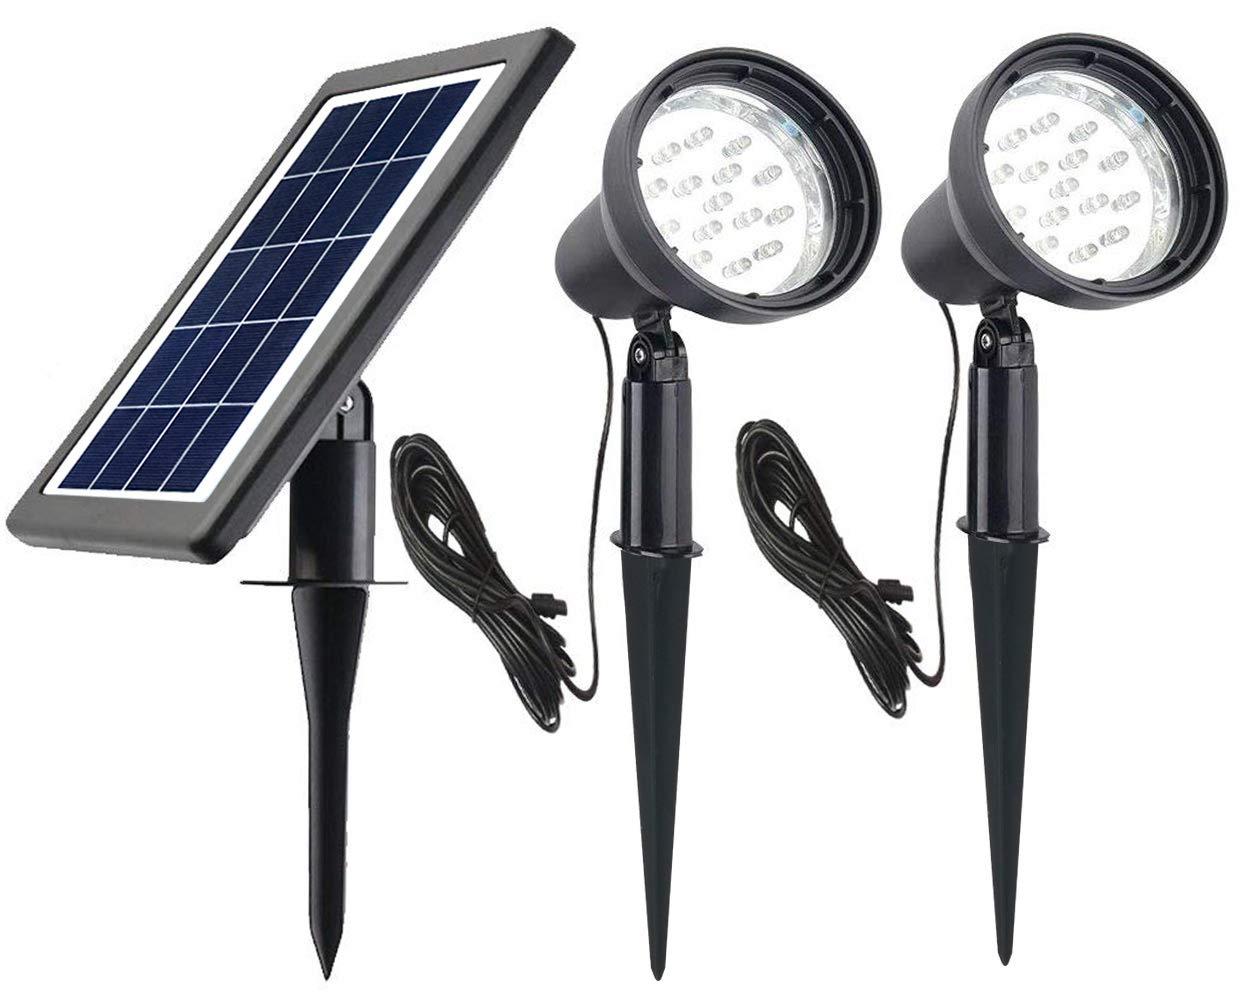 Ntsevsun Solar Spotlights, Power Adjustable, Waterproof Outdoor Solar Landscape Lights for Patio, Garden, Driveway, Pathway, Courtyard, Lawn (White)